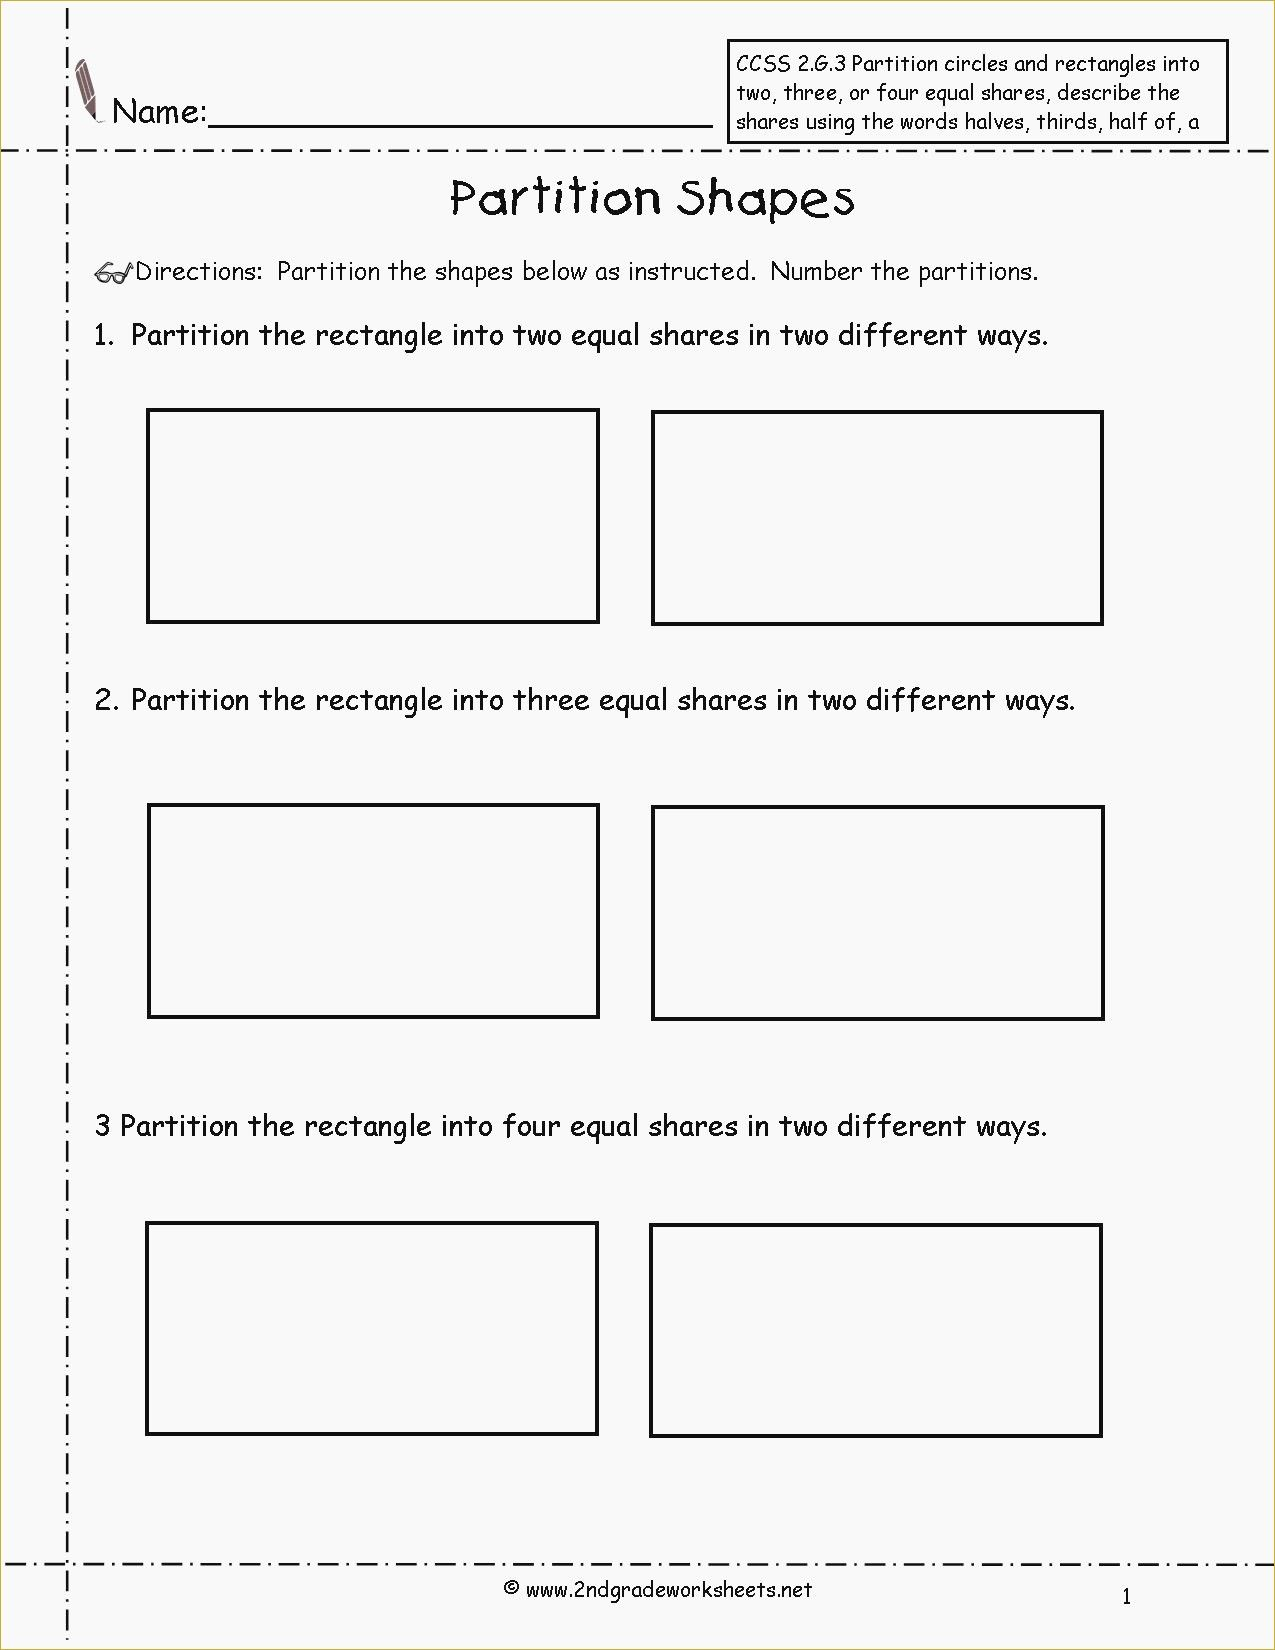 Dividing Shapes Into Equal Parts Worksheet